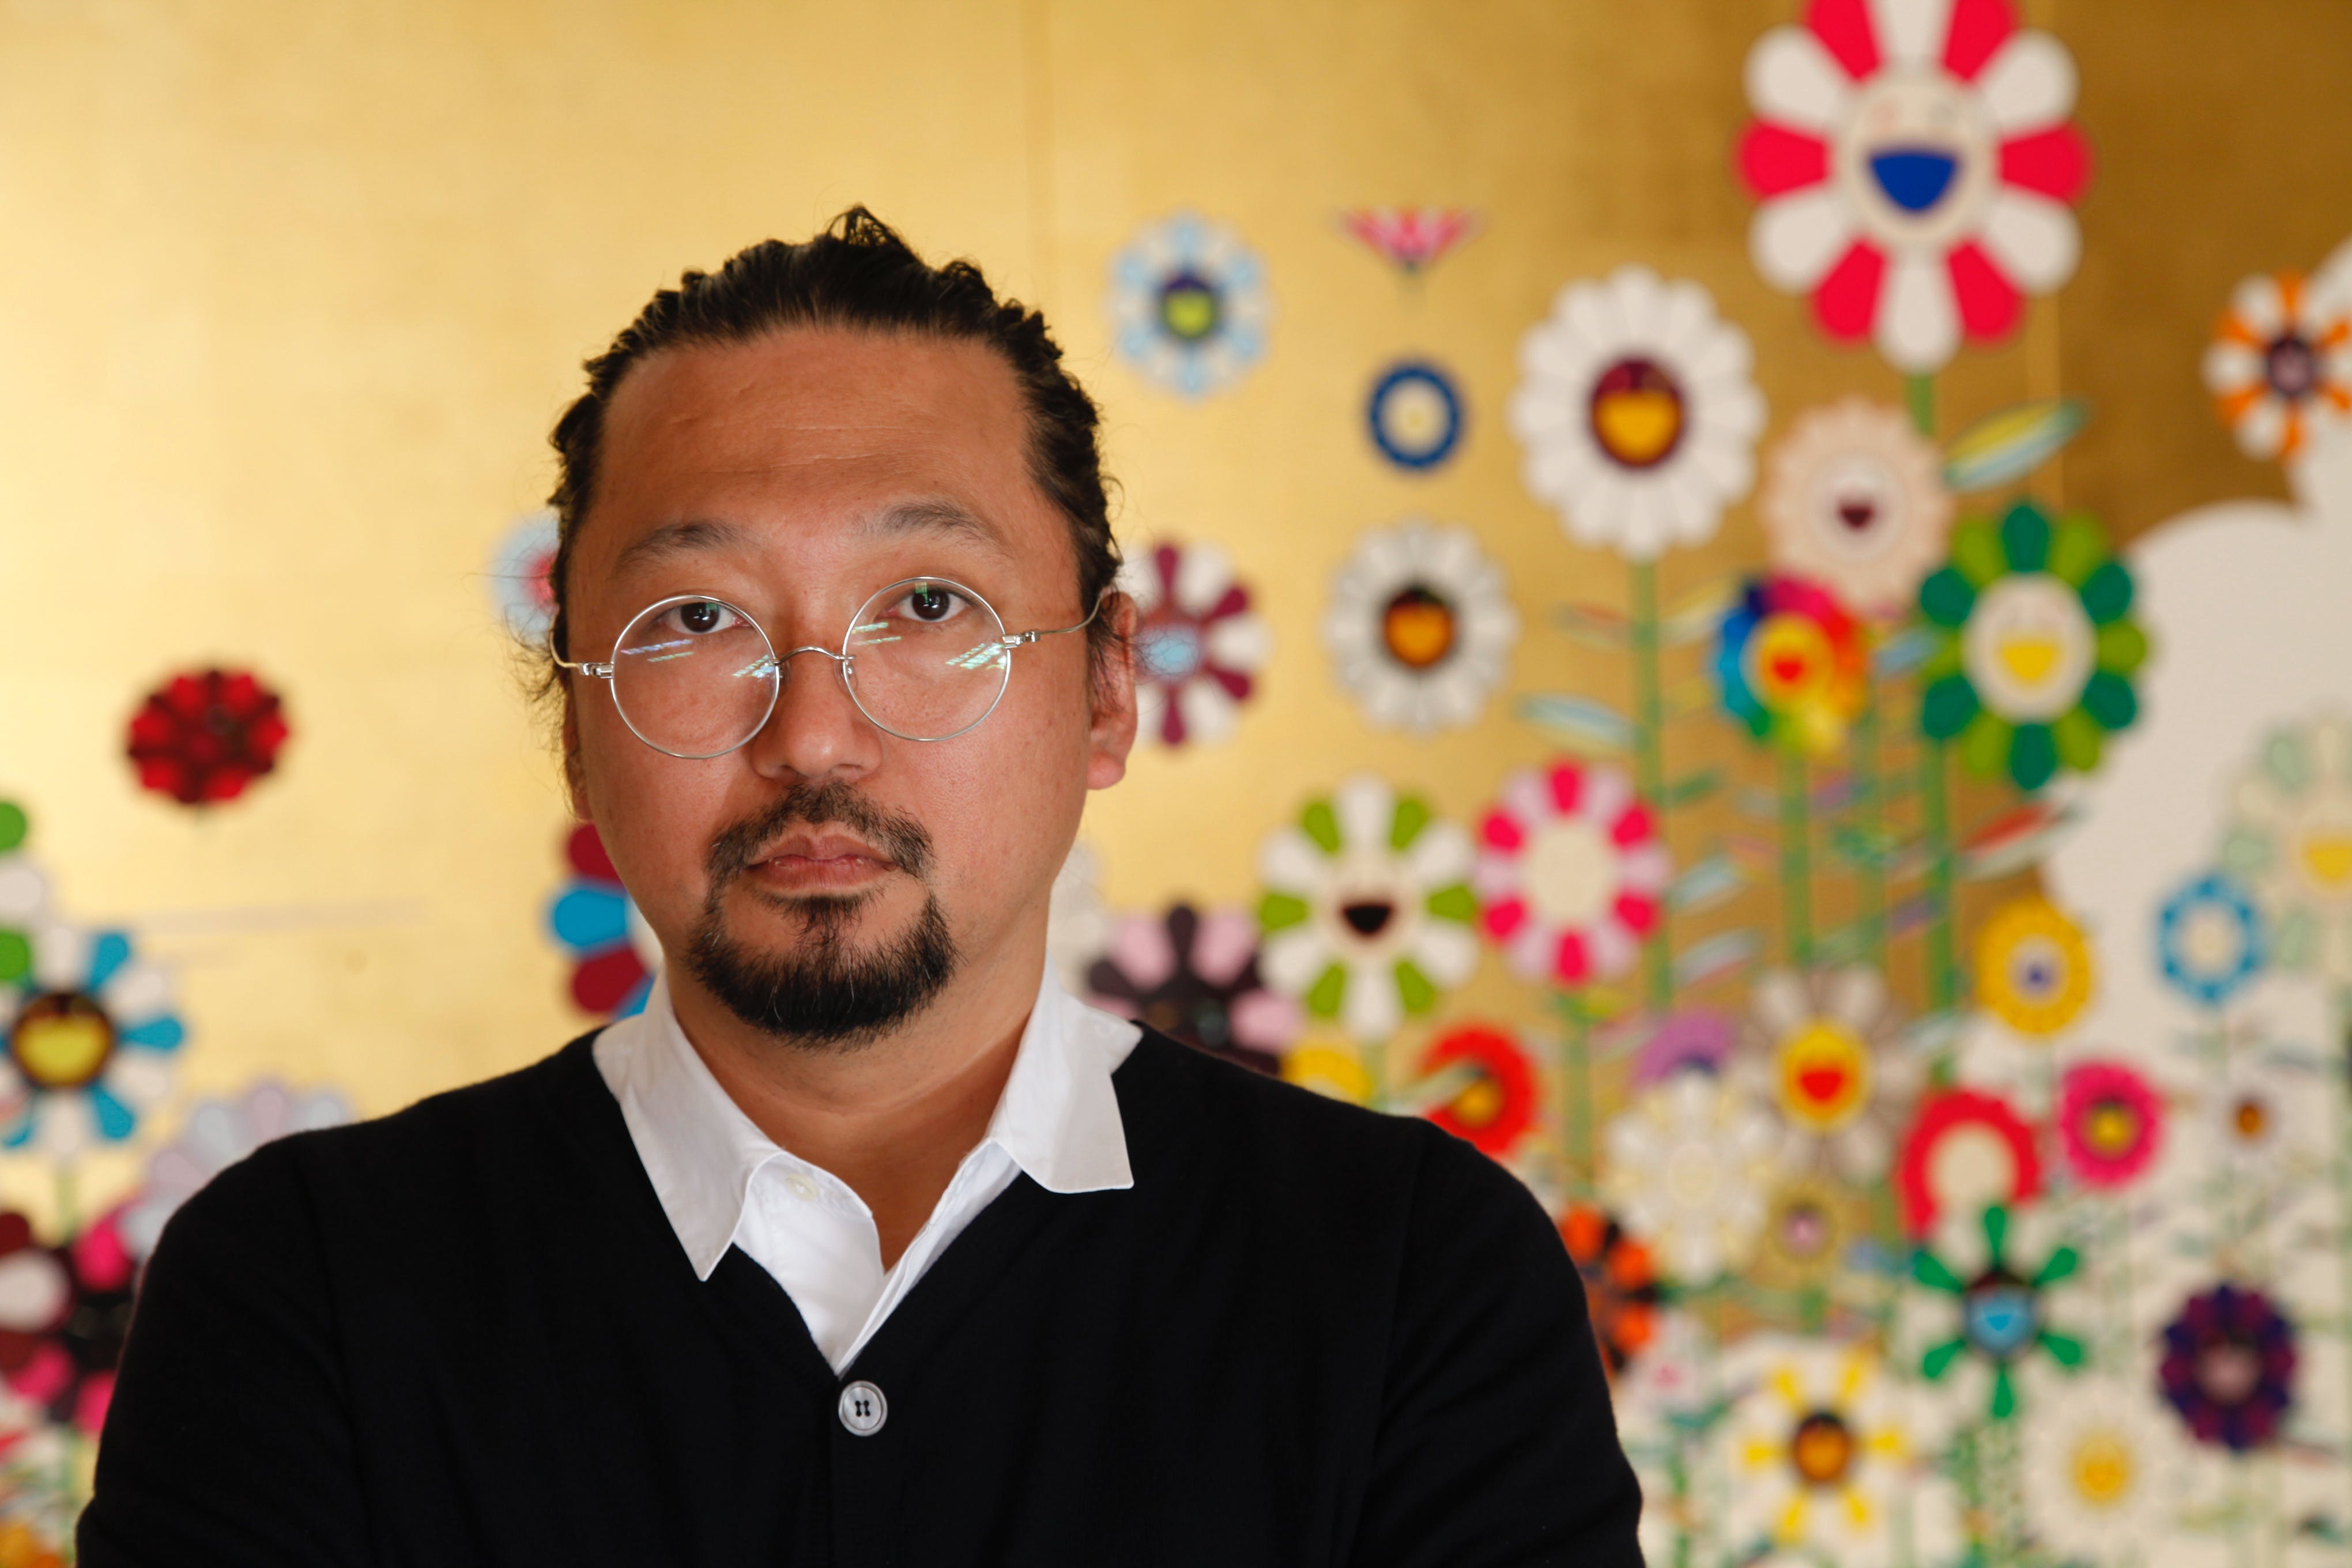 artist Takashi Murakami chicago spring summer events activities